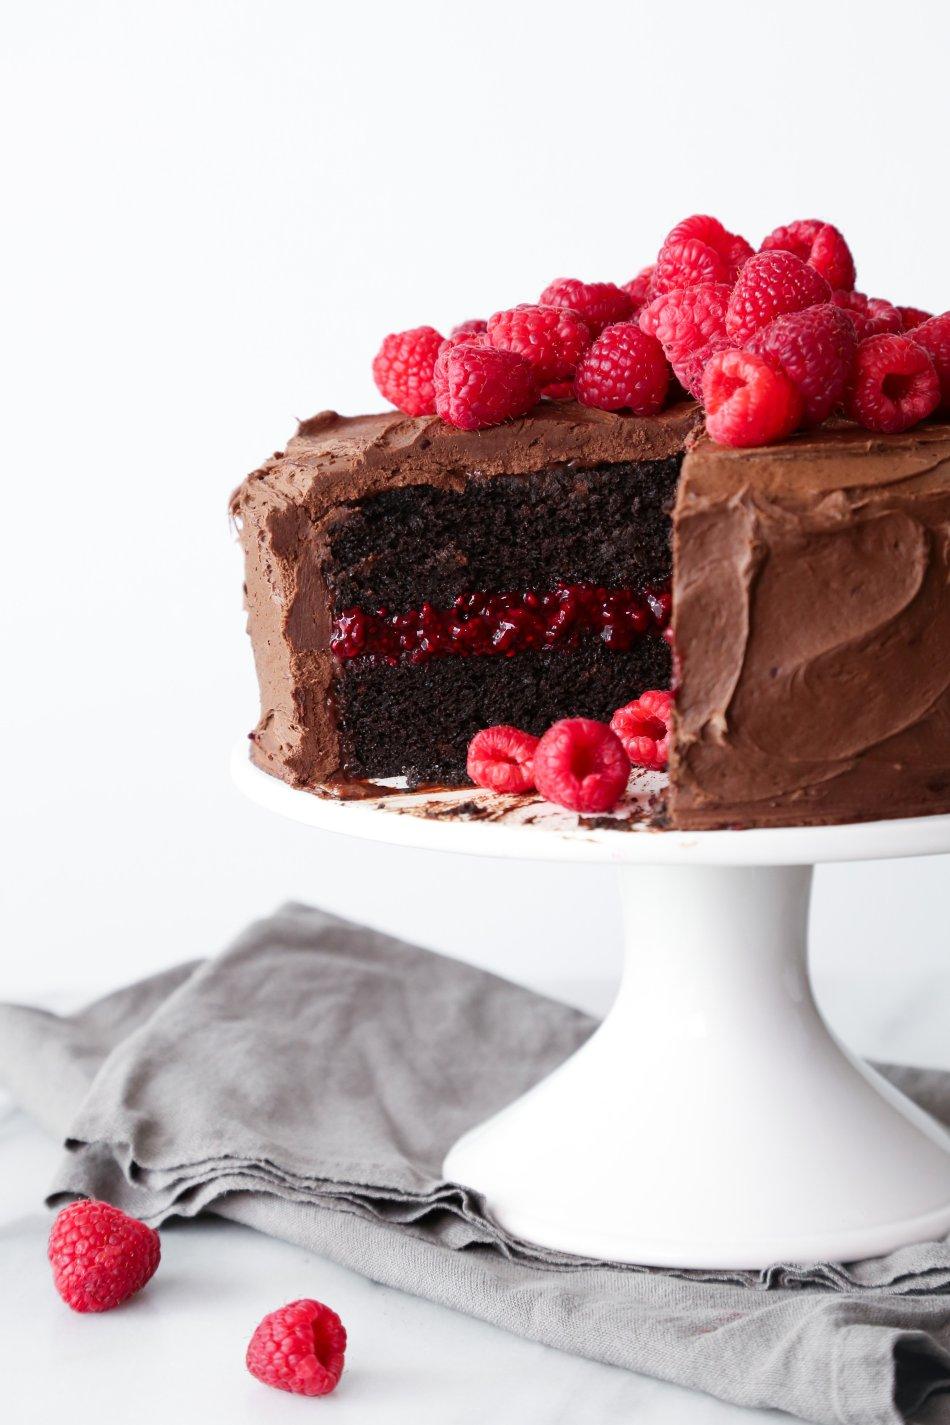 http://www.wifemamafoodie.com/chocolate-raspberry-layer-cake/